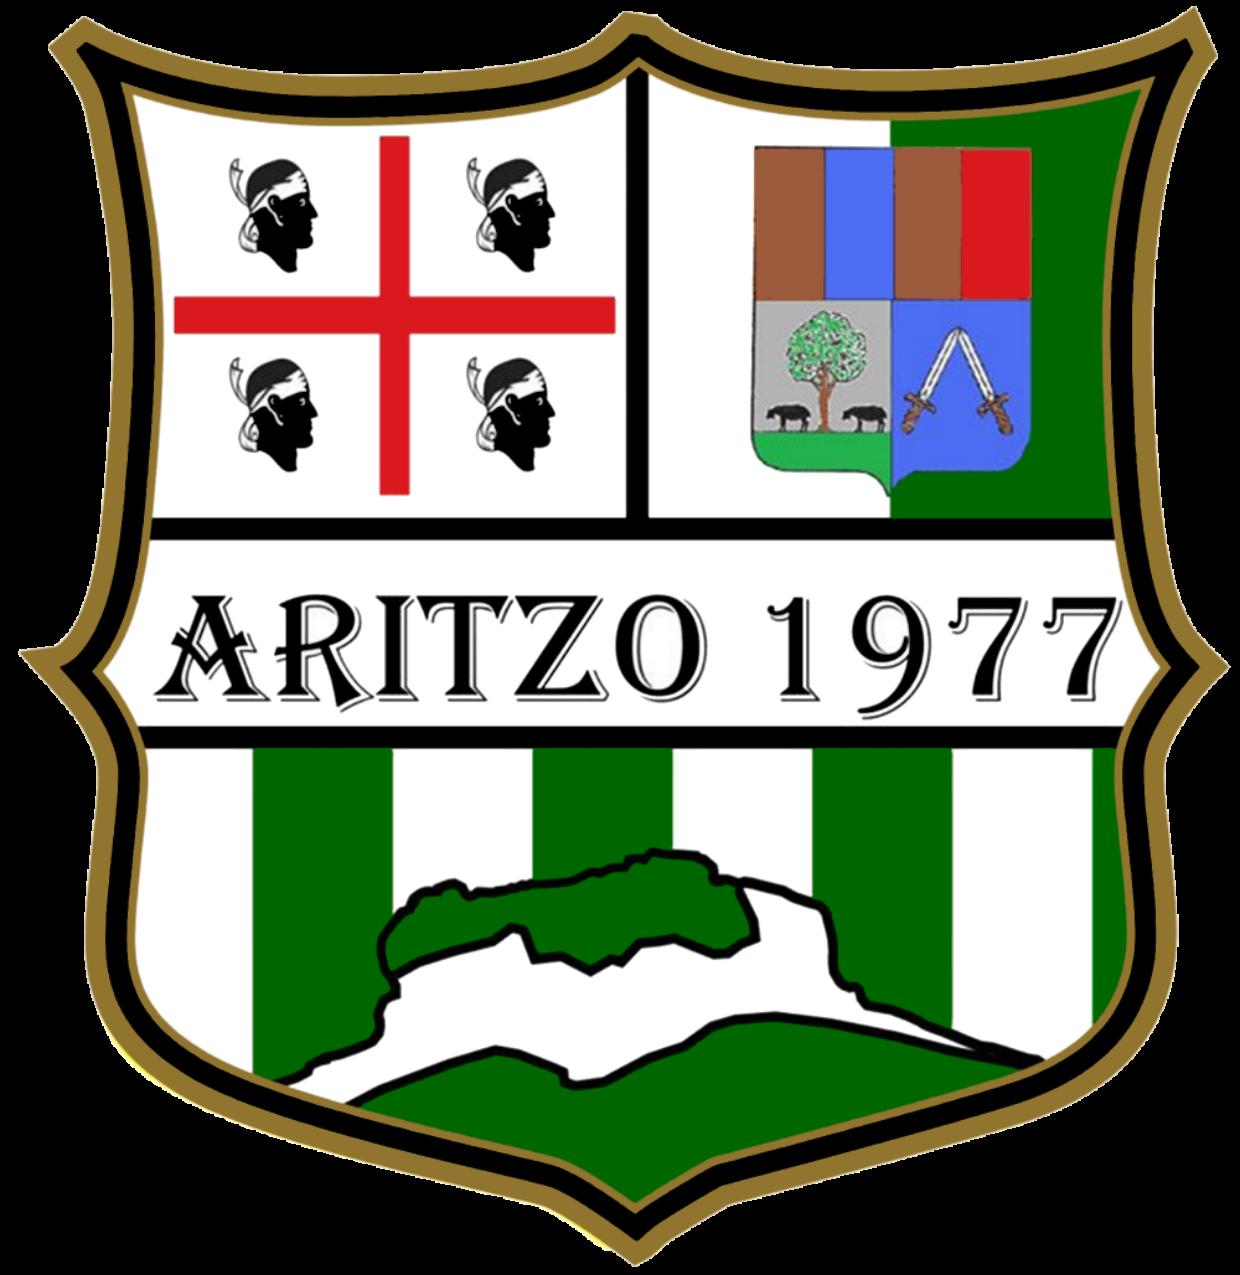 Calendario Prima Categoria Sardegna.Aritzo 1977 Calendario Squadra Sardegna Nuoro Prima